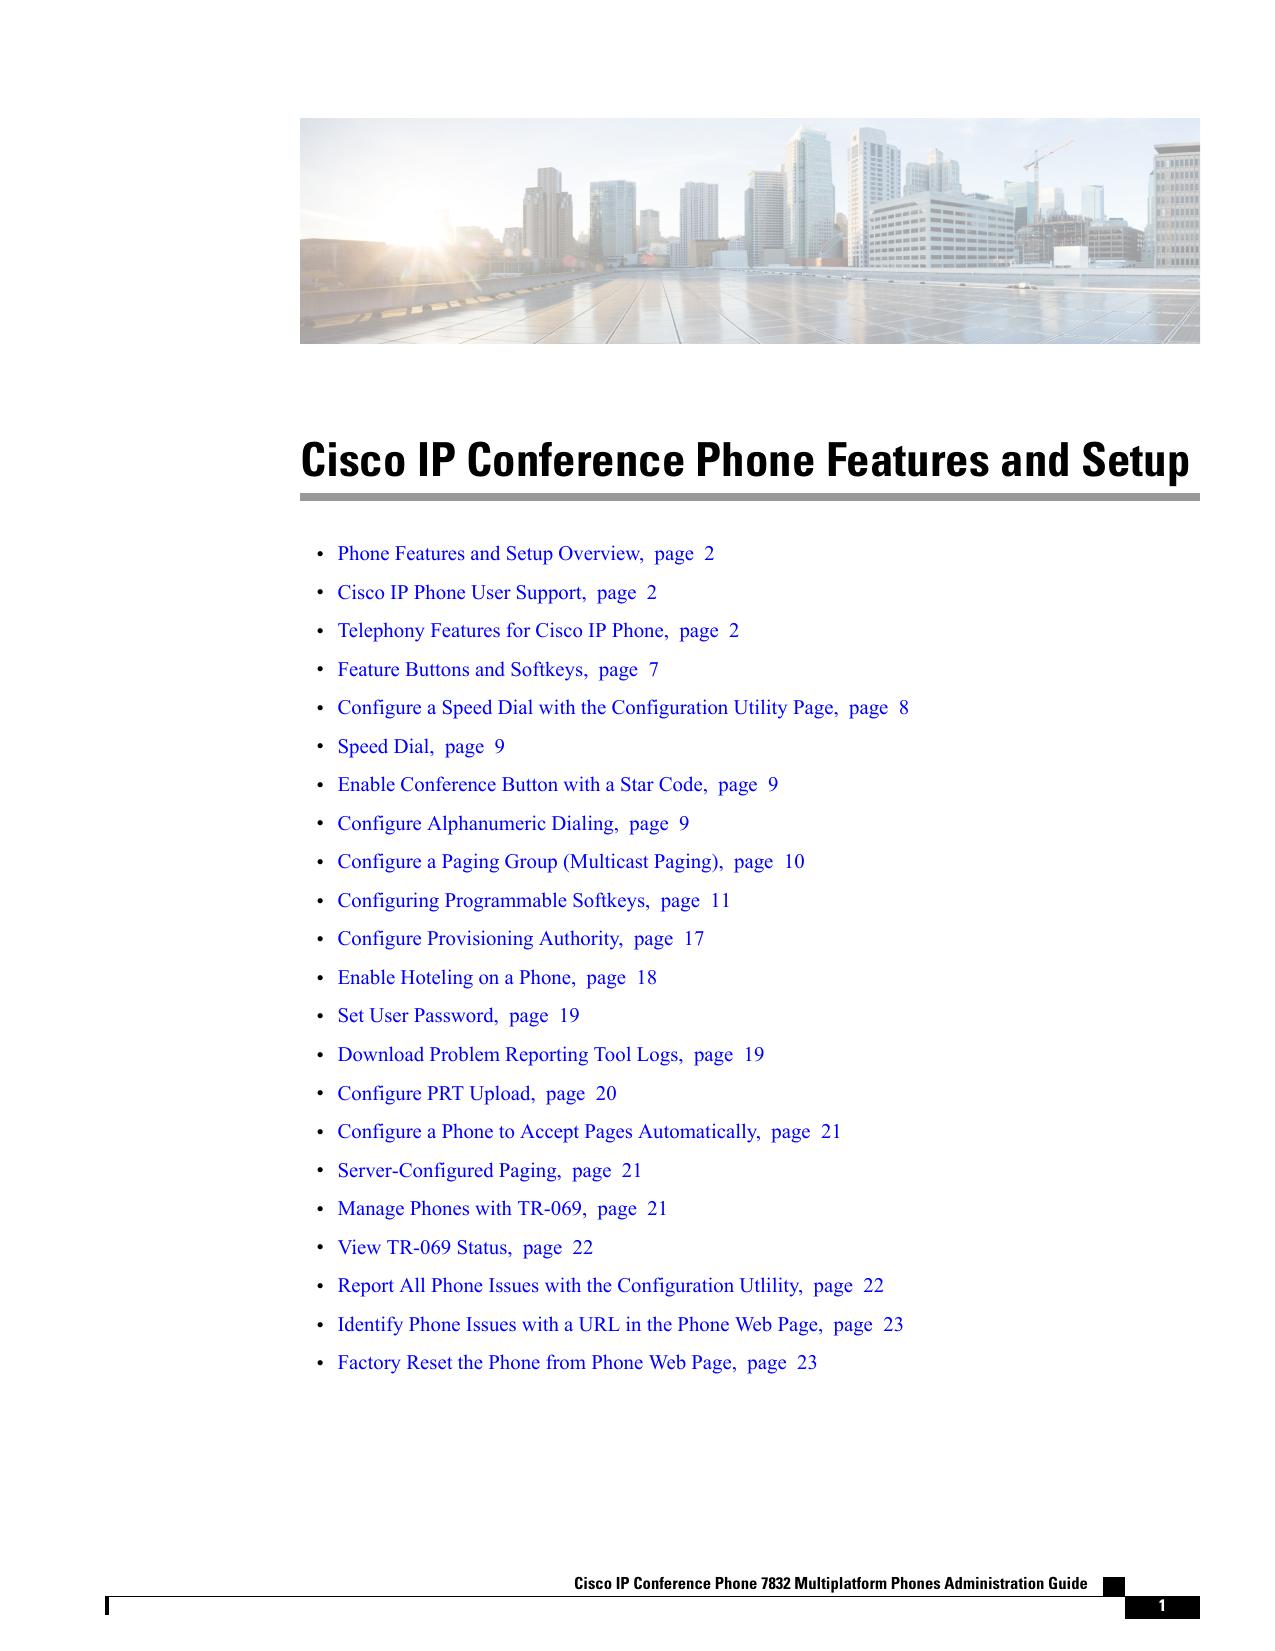 Cisco IP Conference Phone Features and Setup | manualzz com